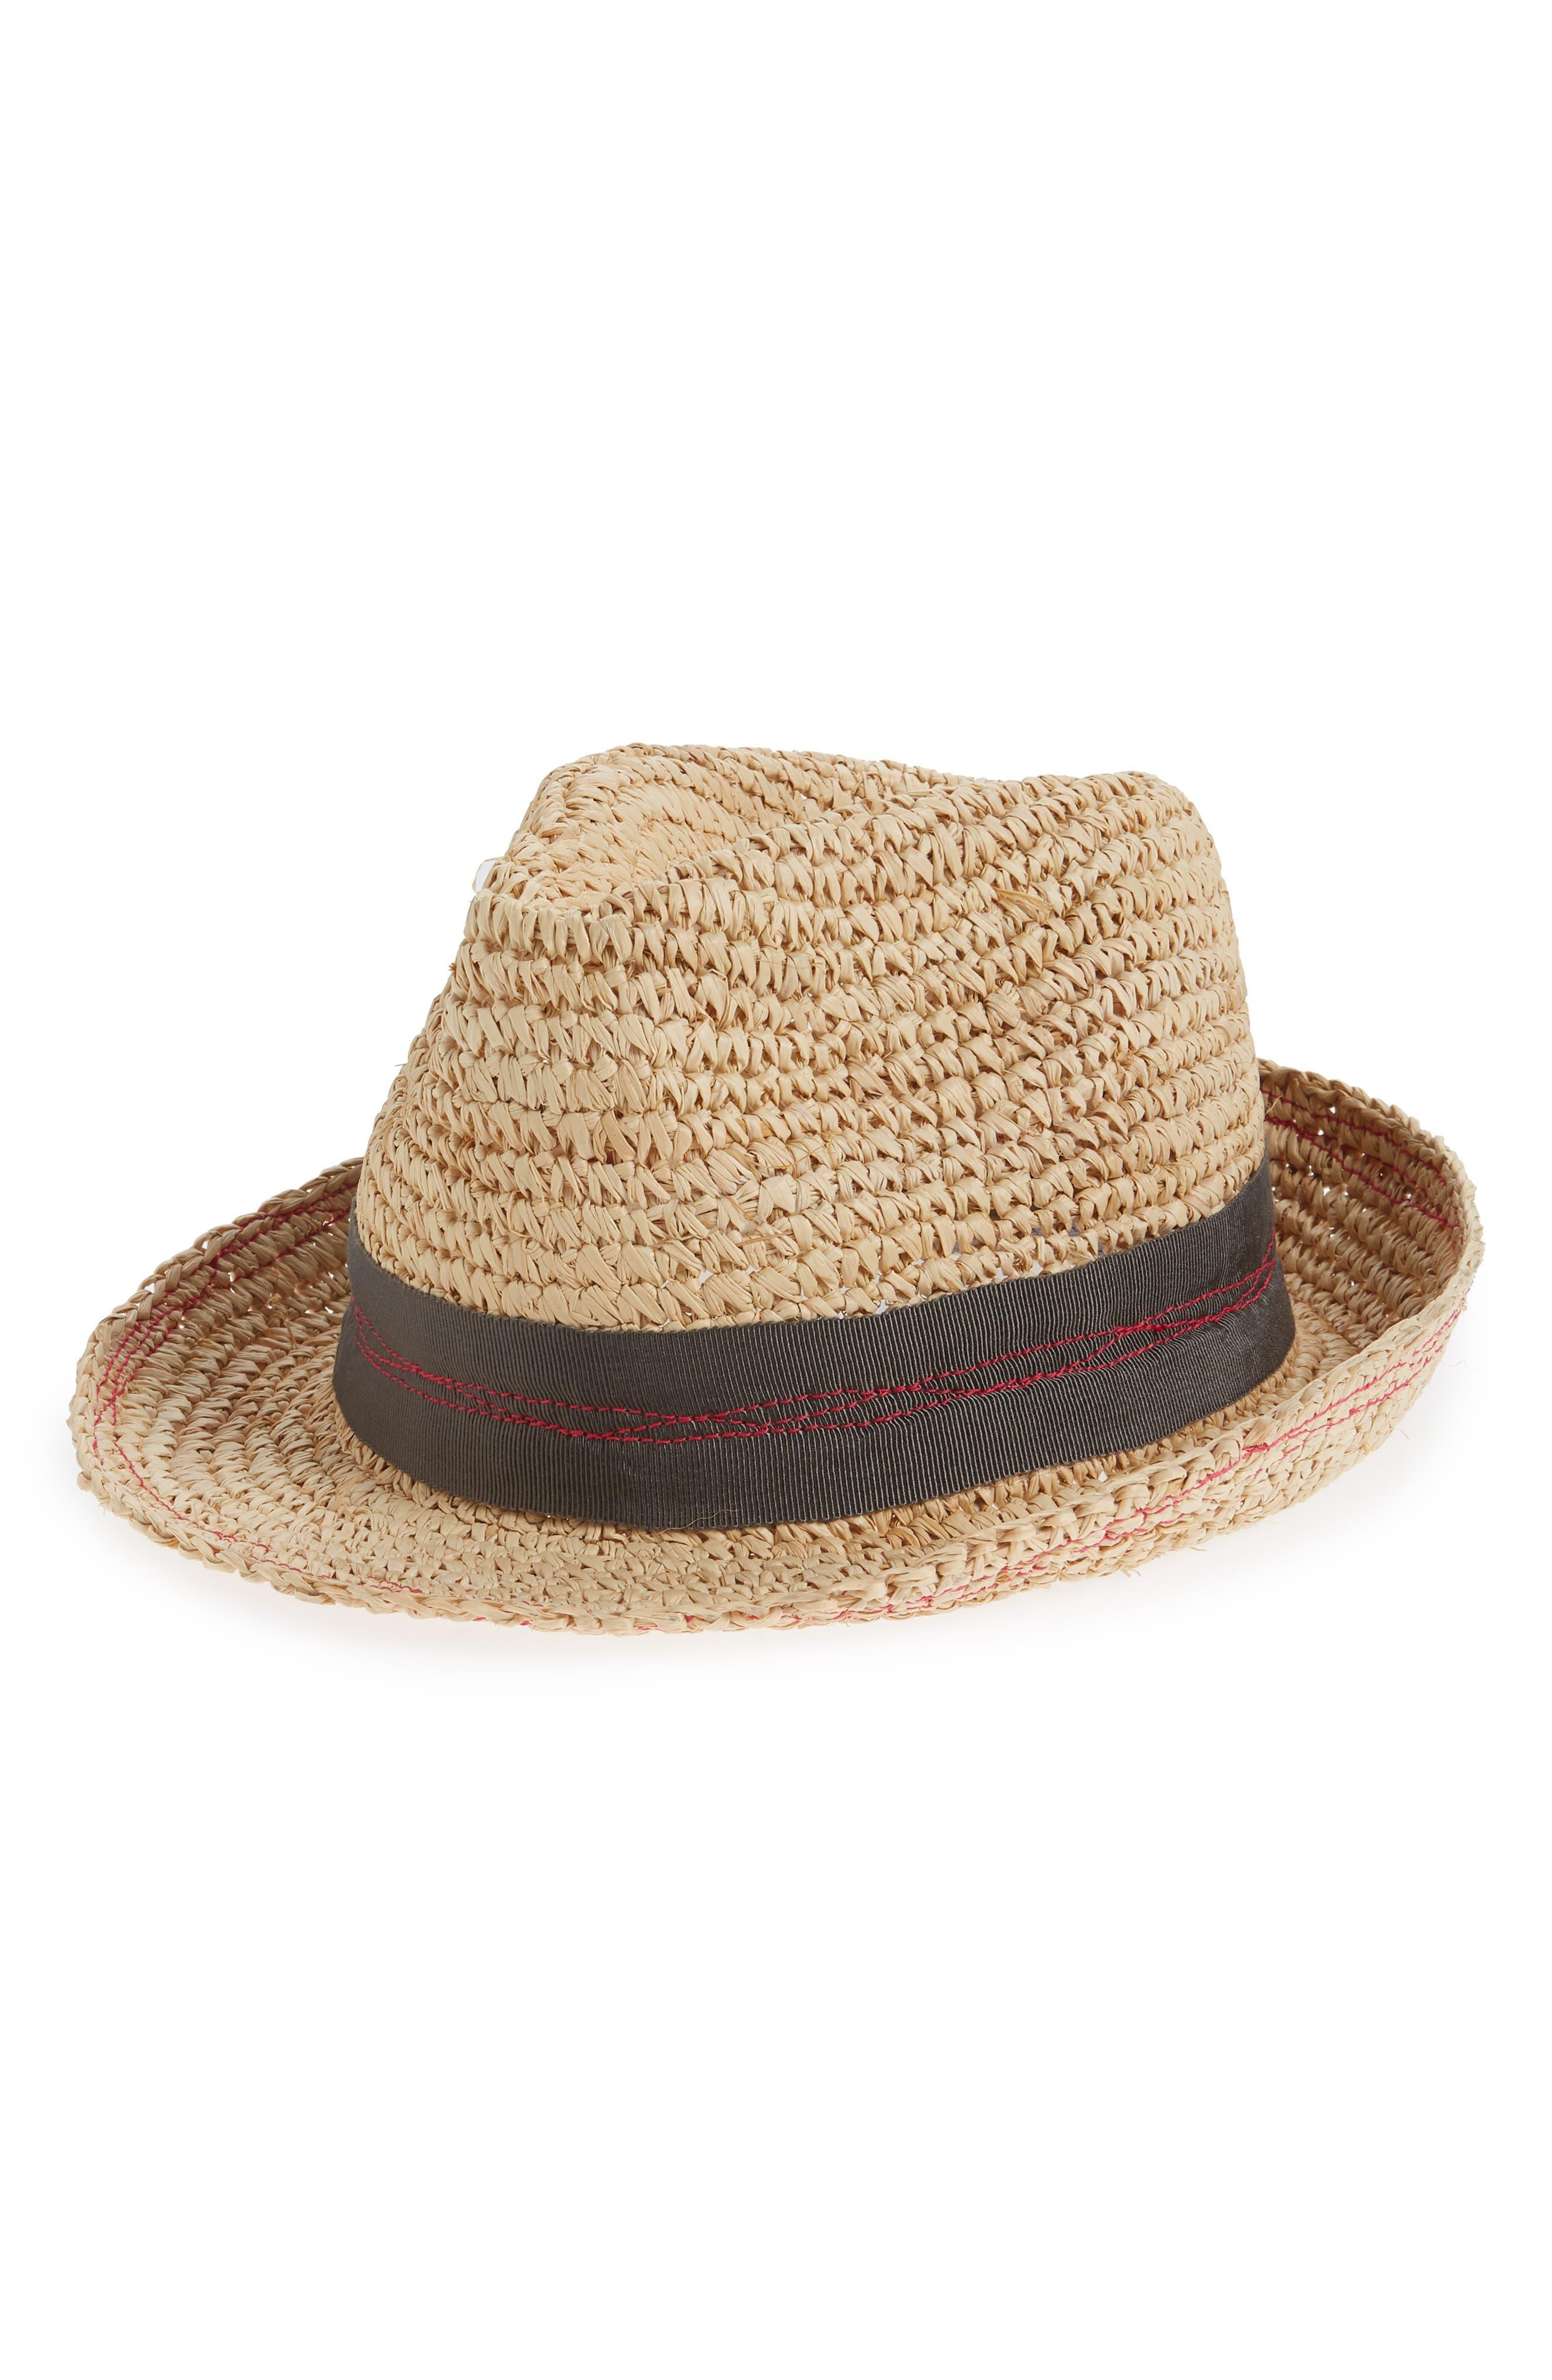 Tarboush Azure Raffia Hat,                             Main thumbnail 1, color,                             GREY